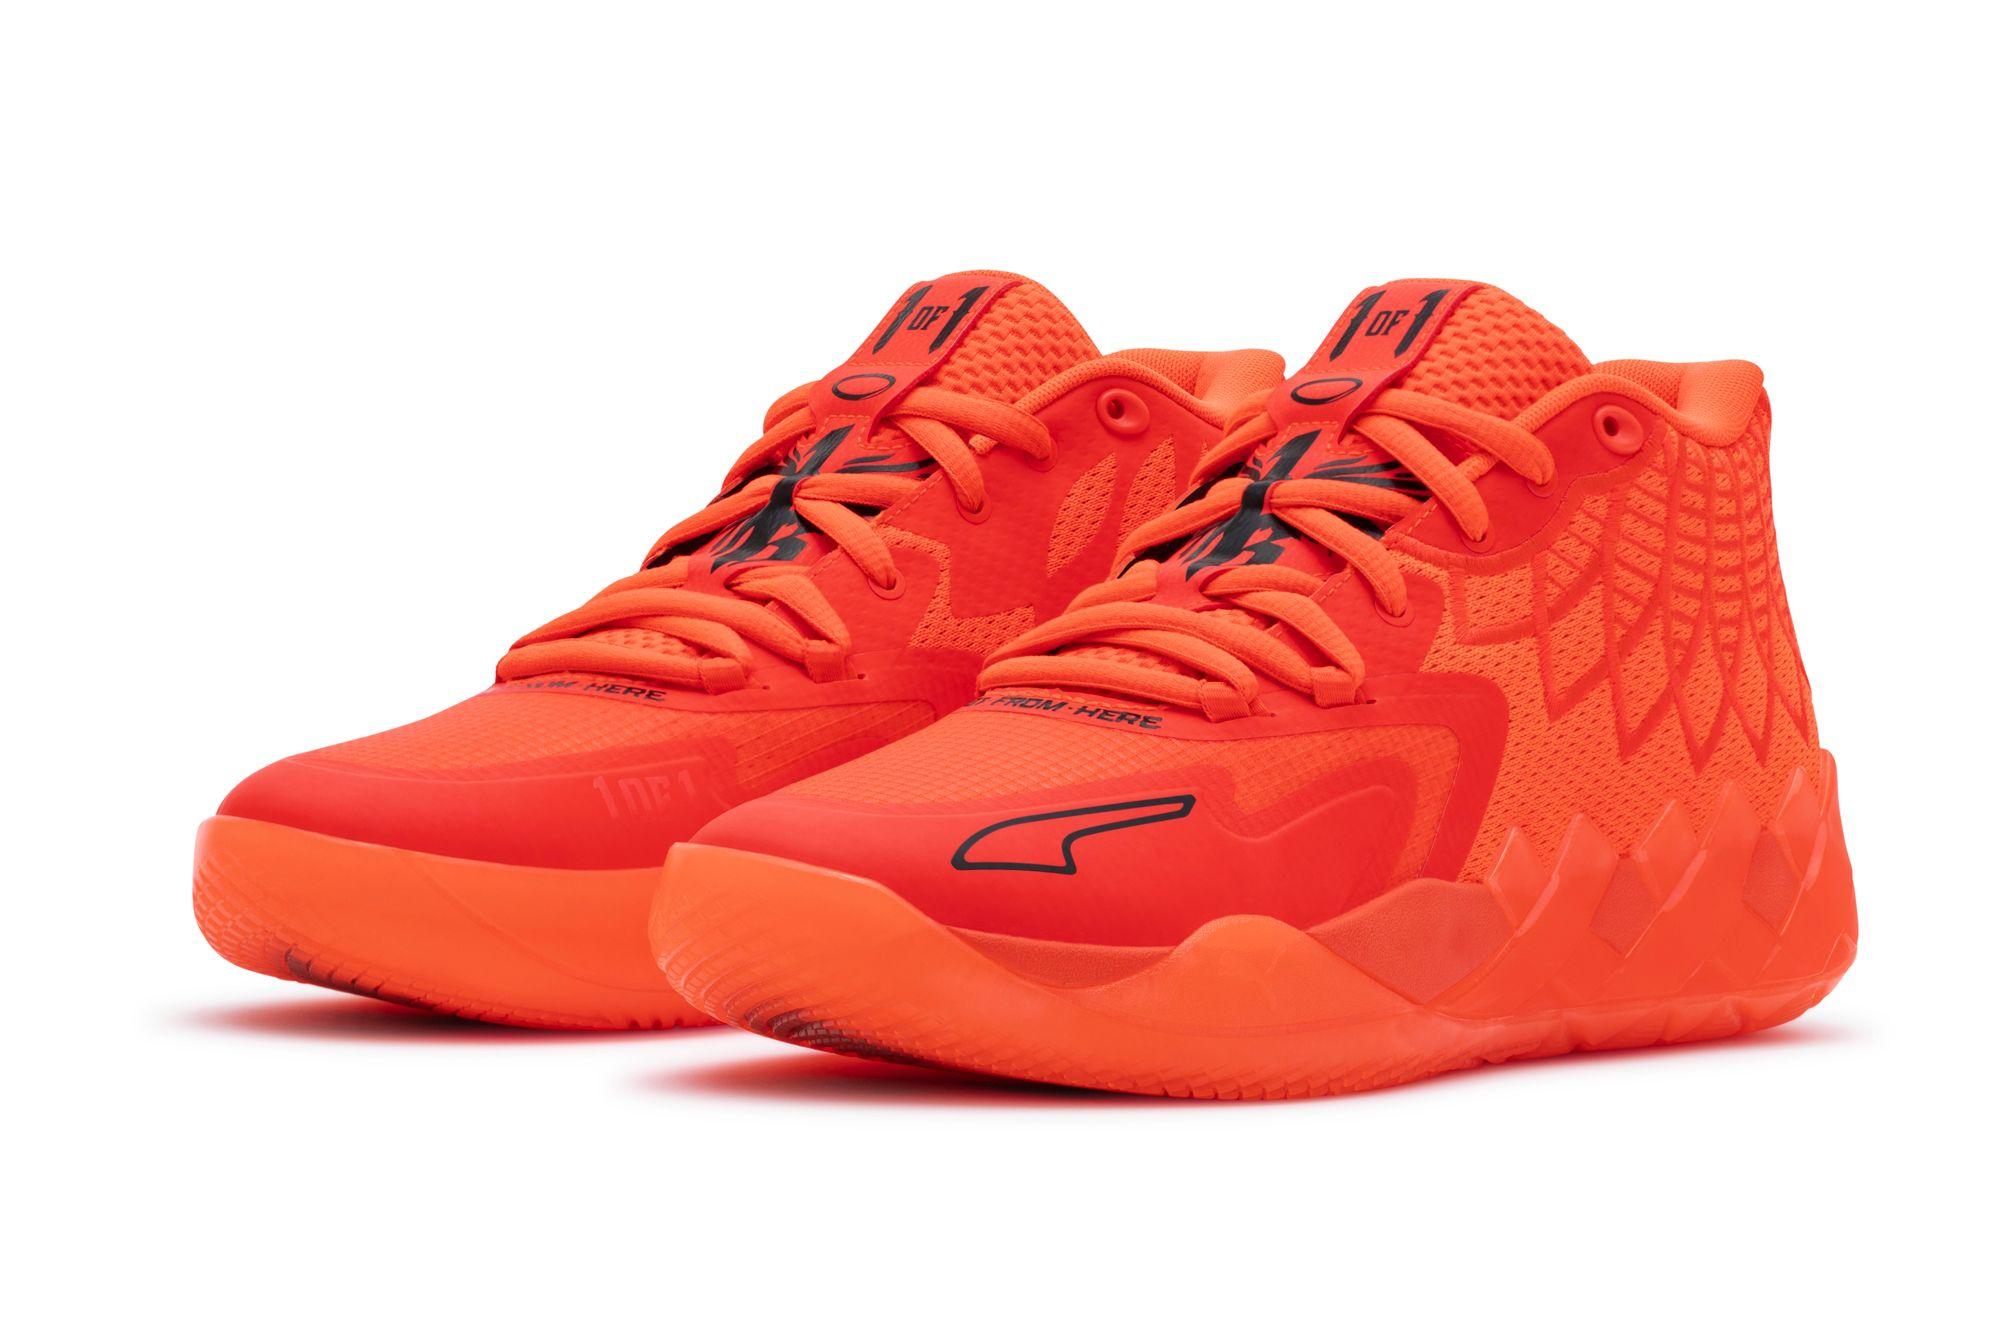 LaMelo Ball x PUMA MB.01 Signature Sneaker